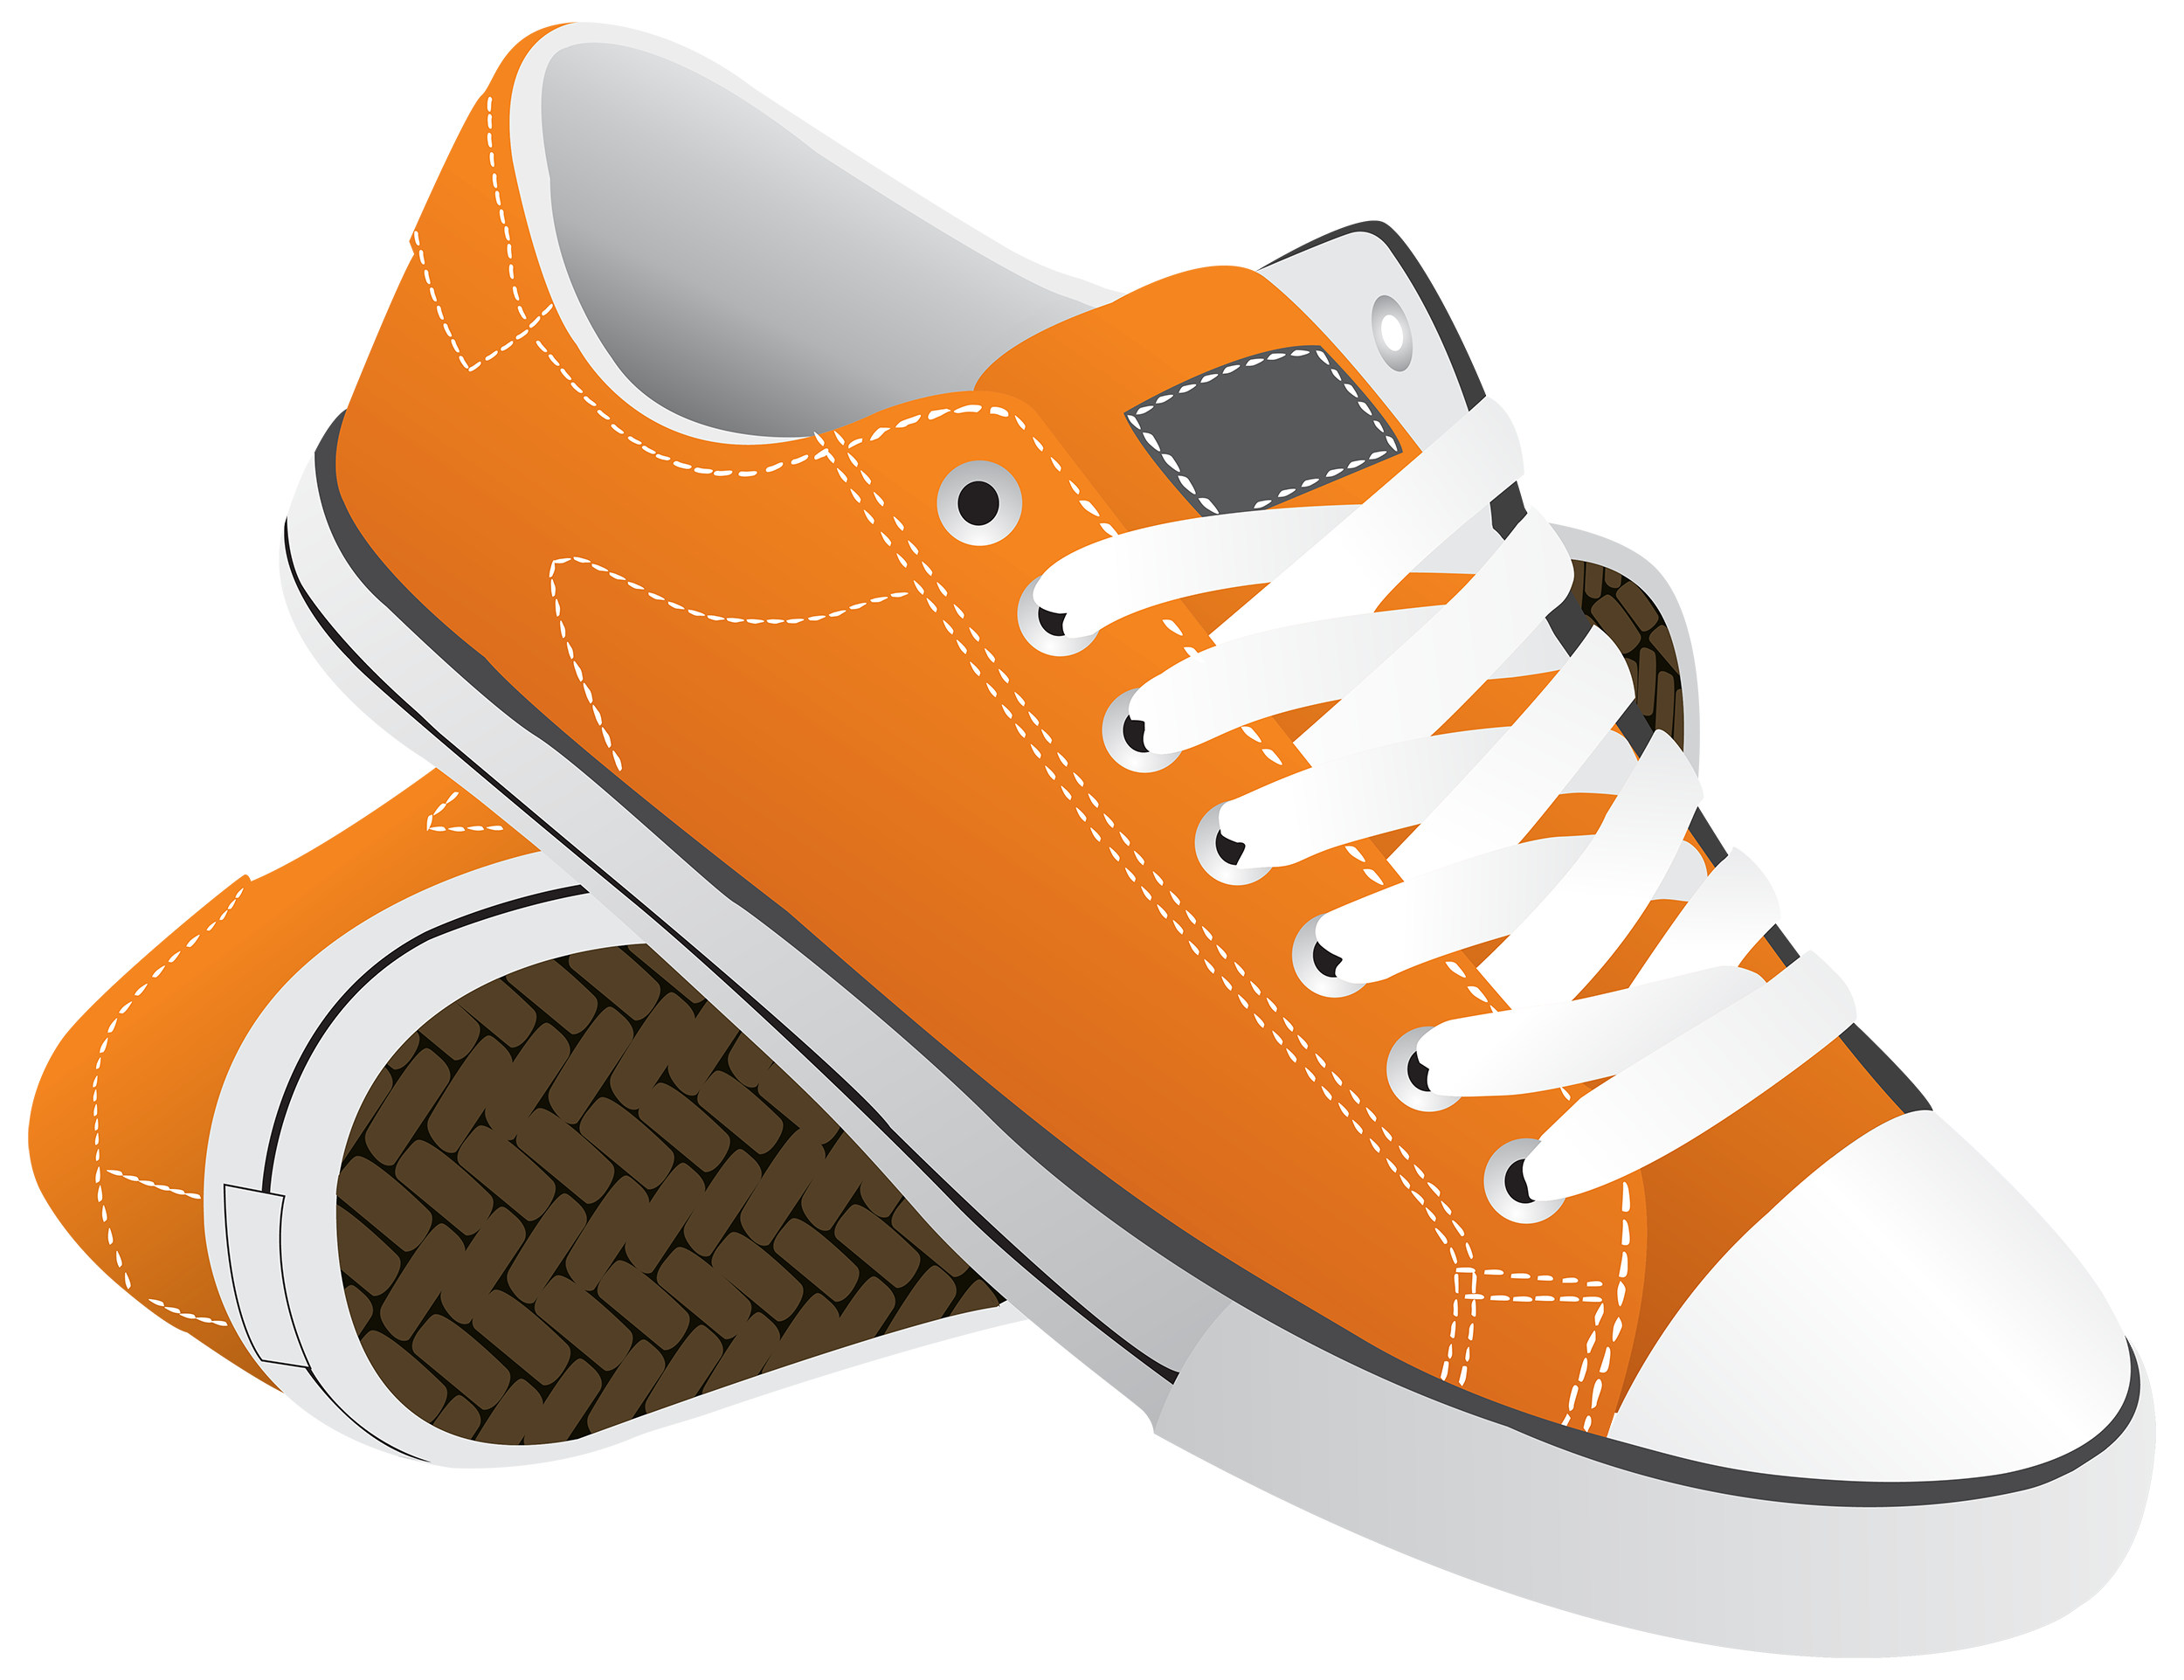 Higj School Boys Tennis Shoes